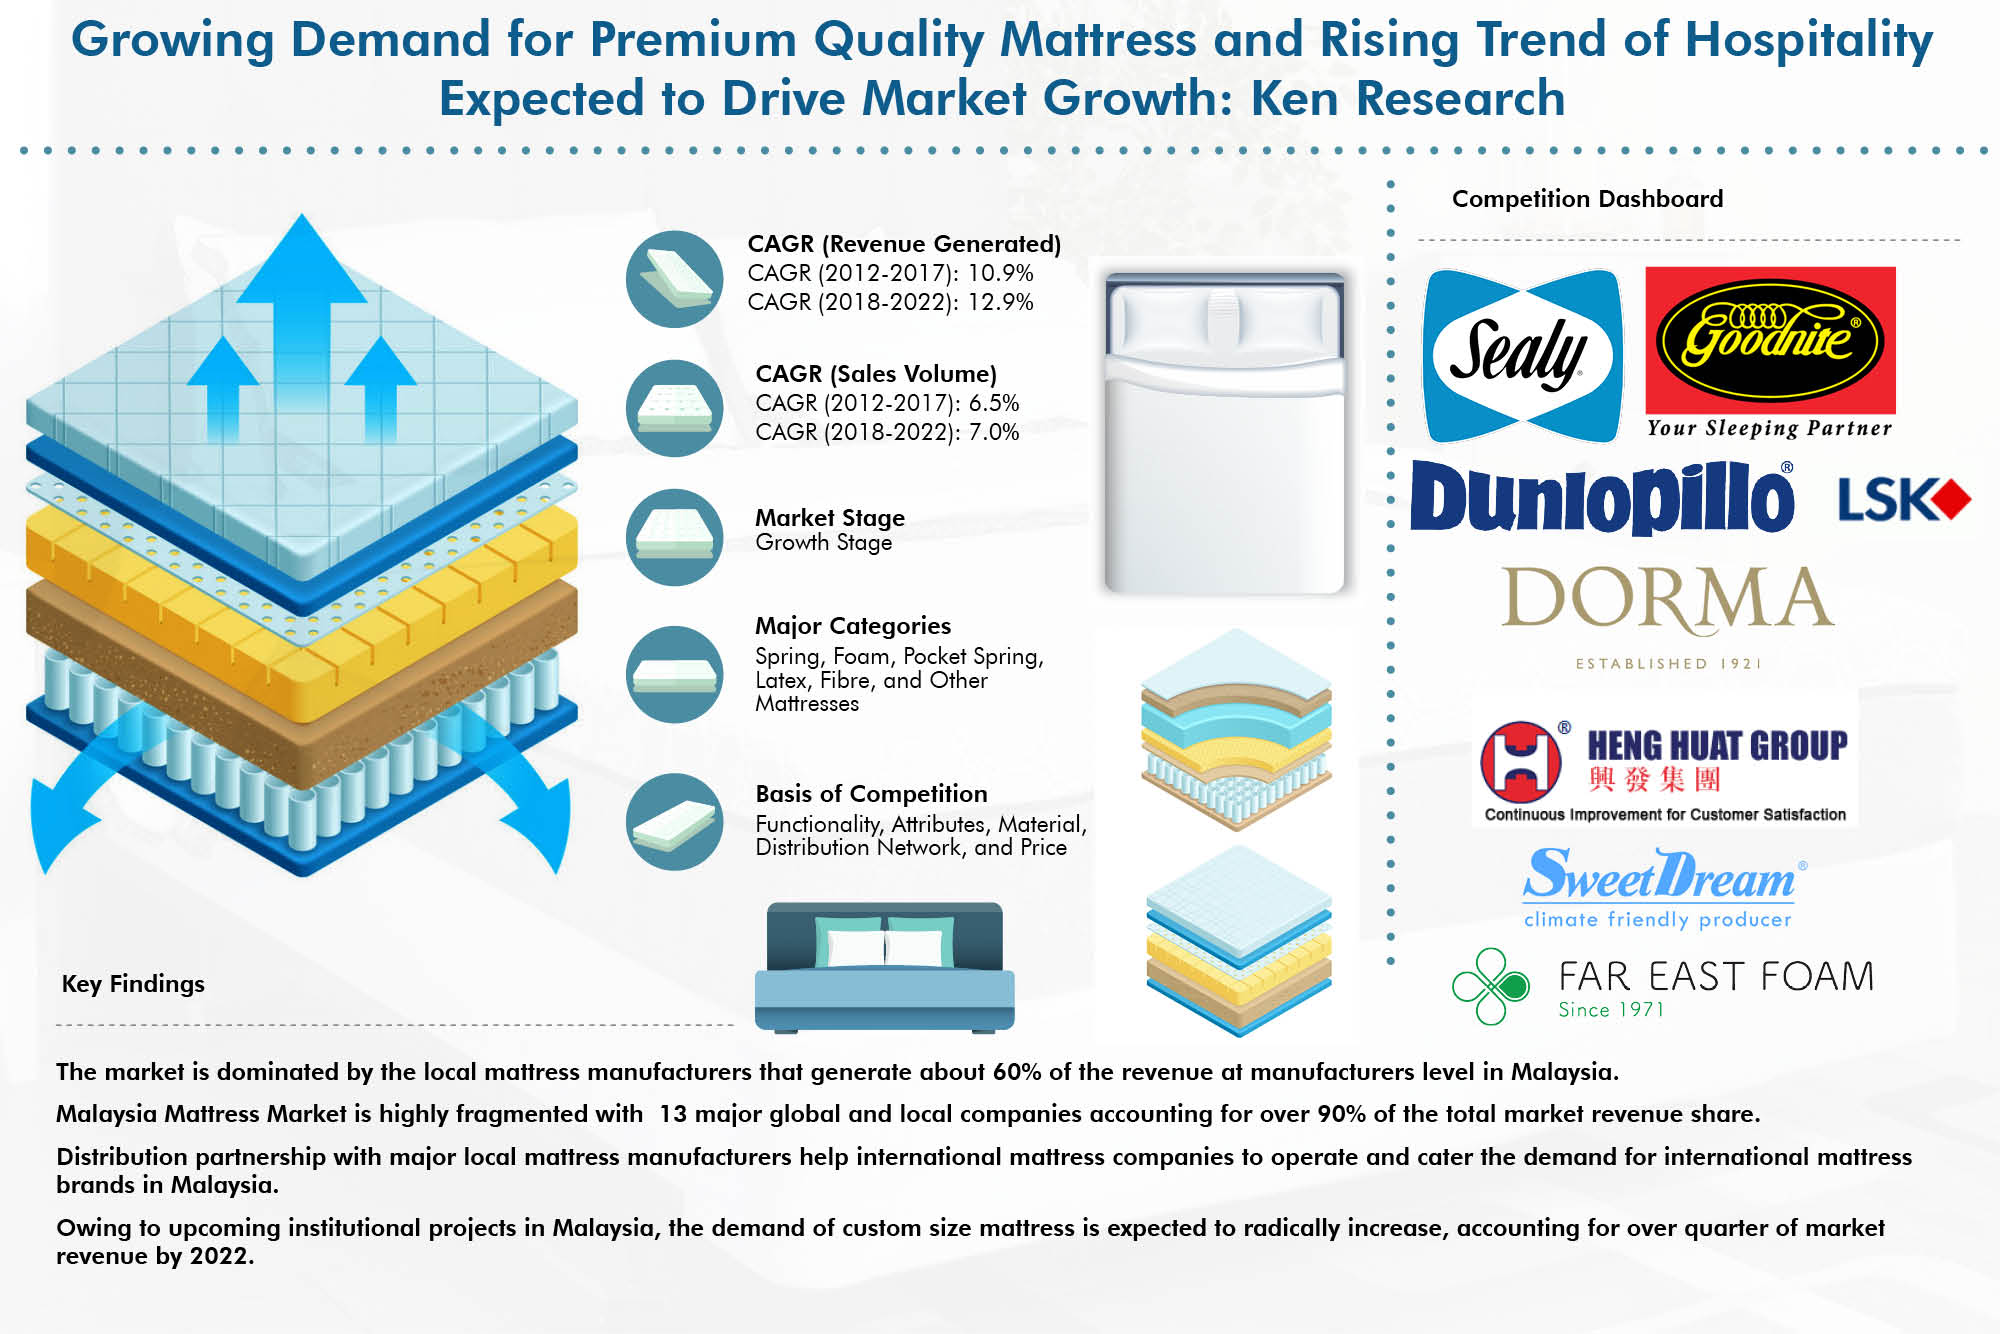 Malaysia Custom Mattress, Hospital Bed Mattress Sales Malaysia : Ken